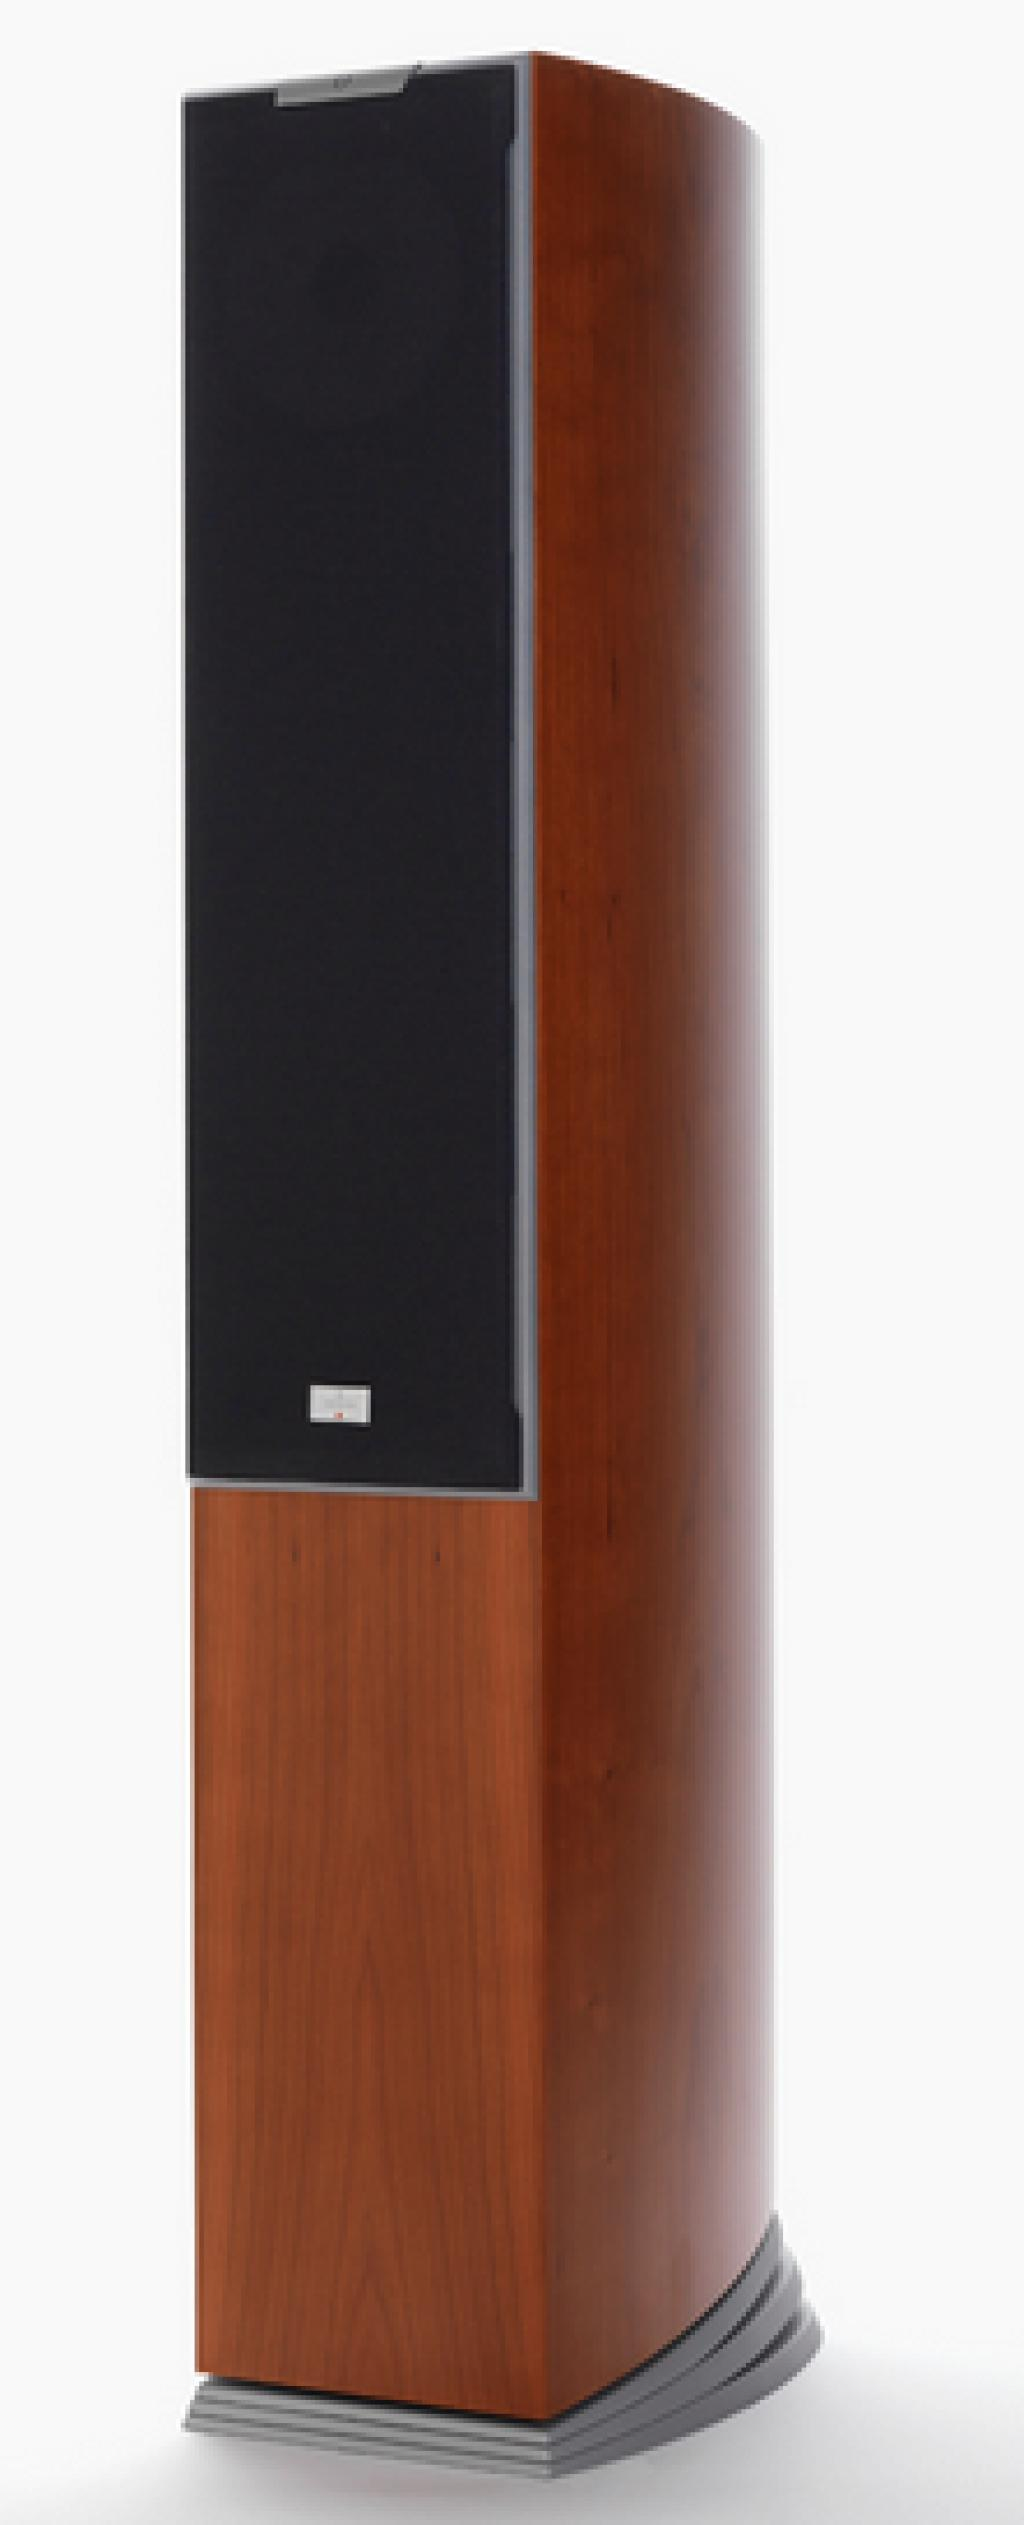 Boxe Audiovector SR 3 Avantgarde Arrete